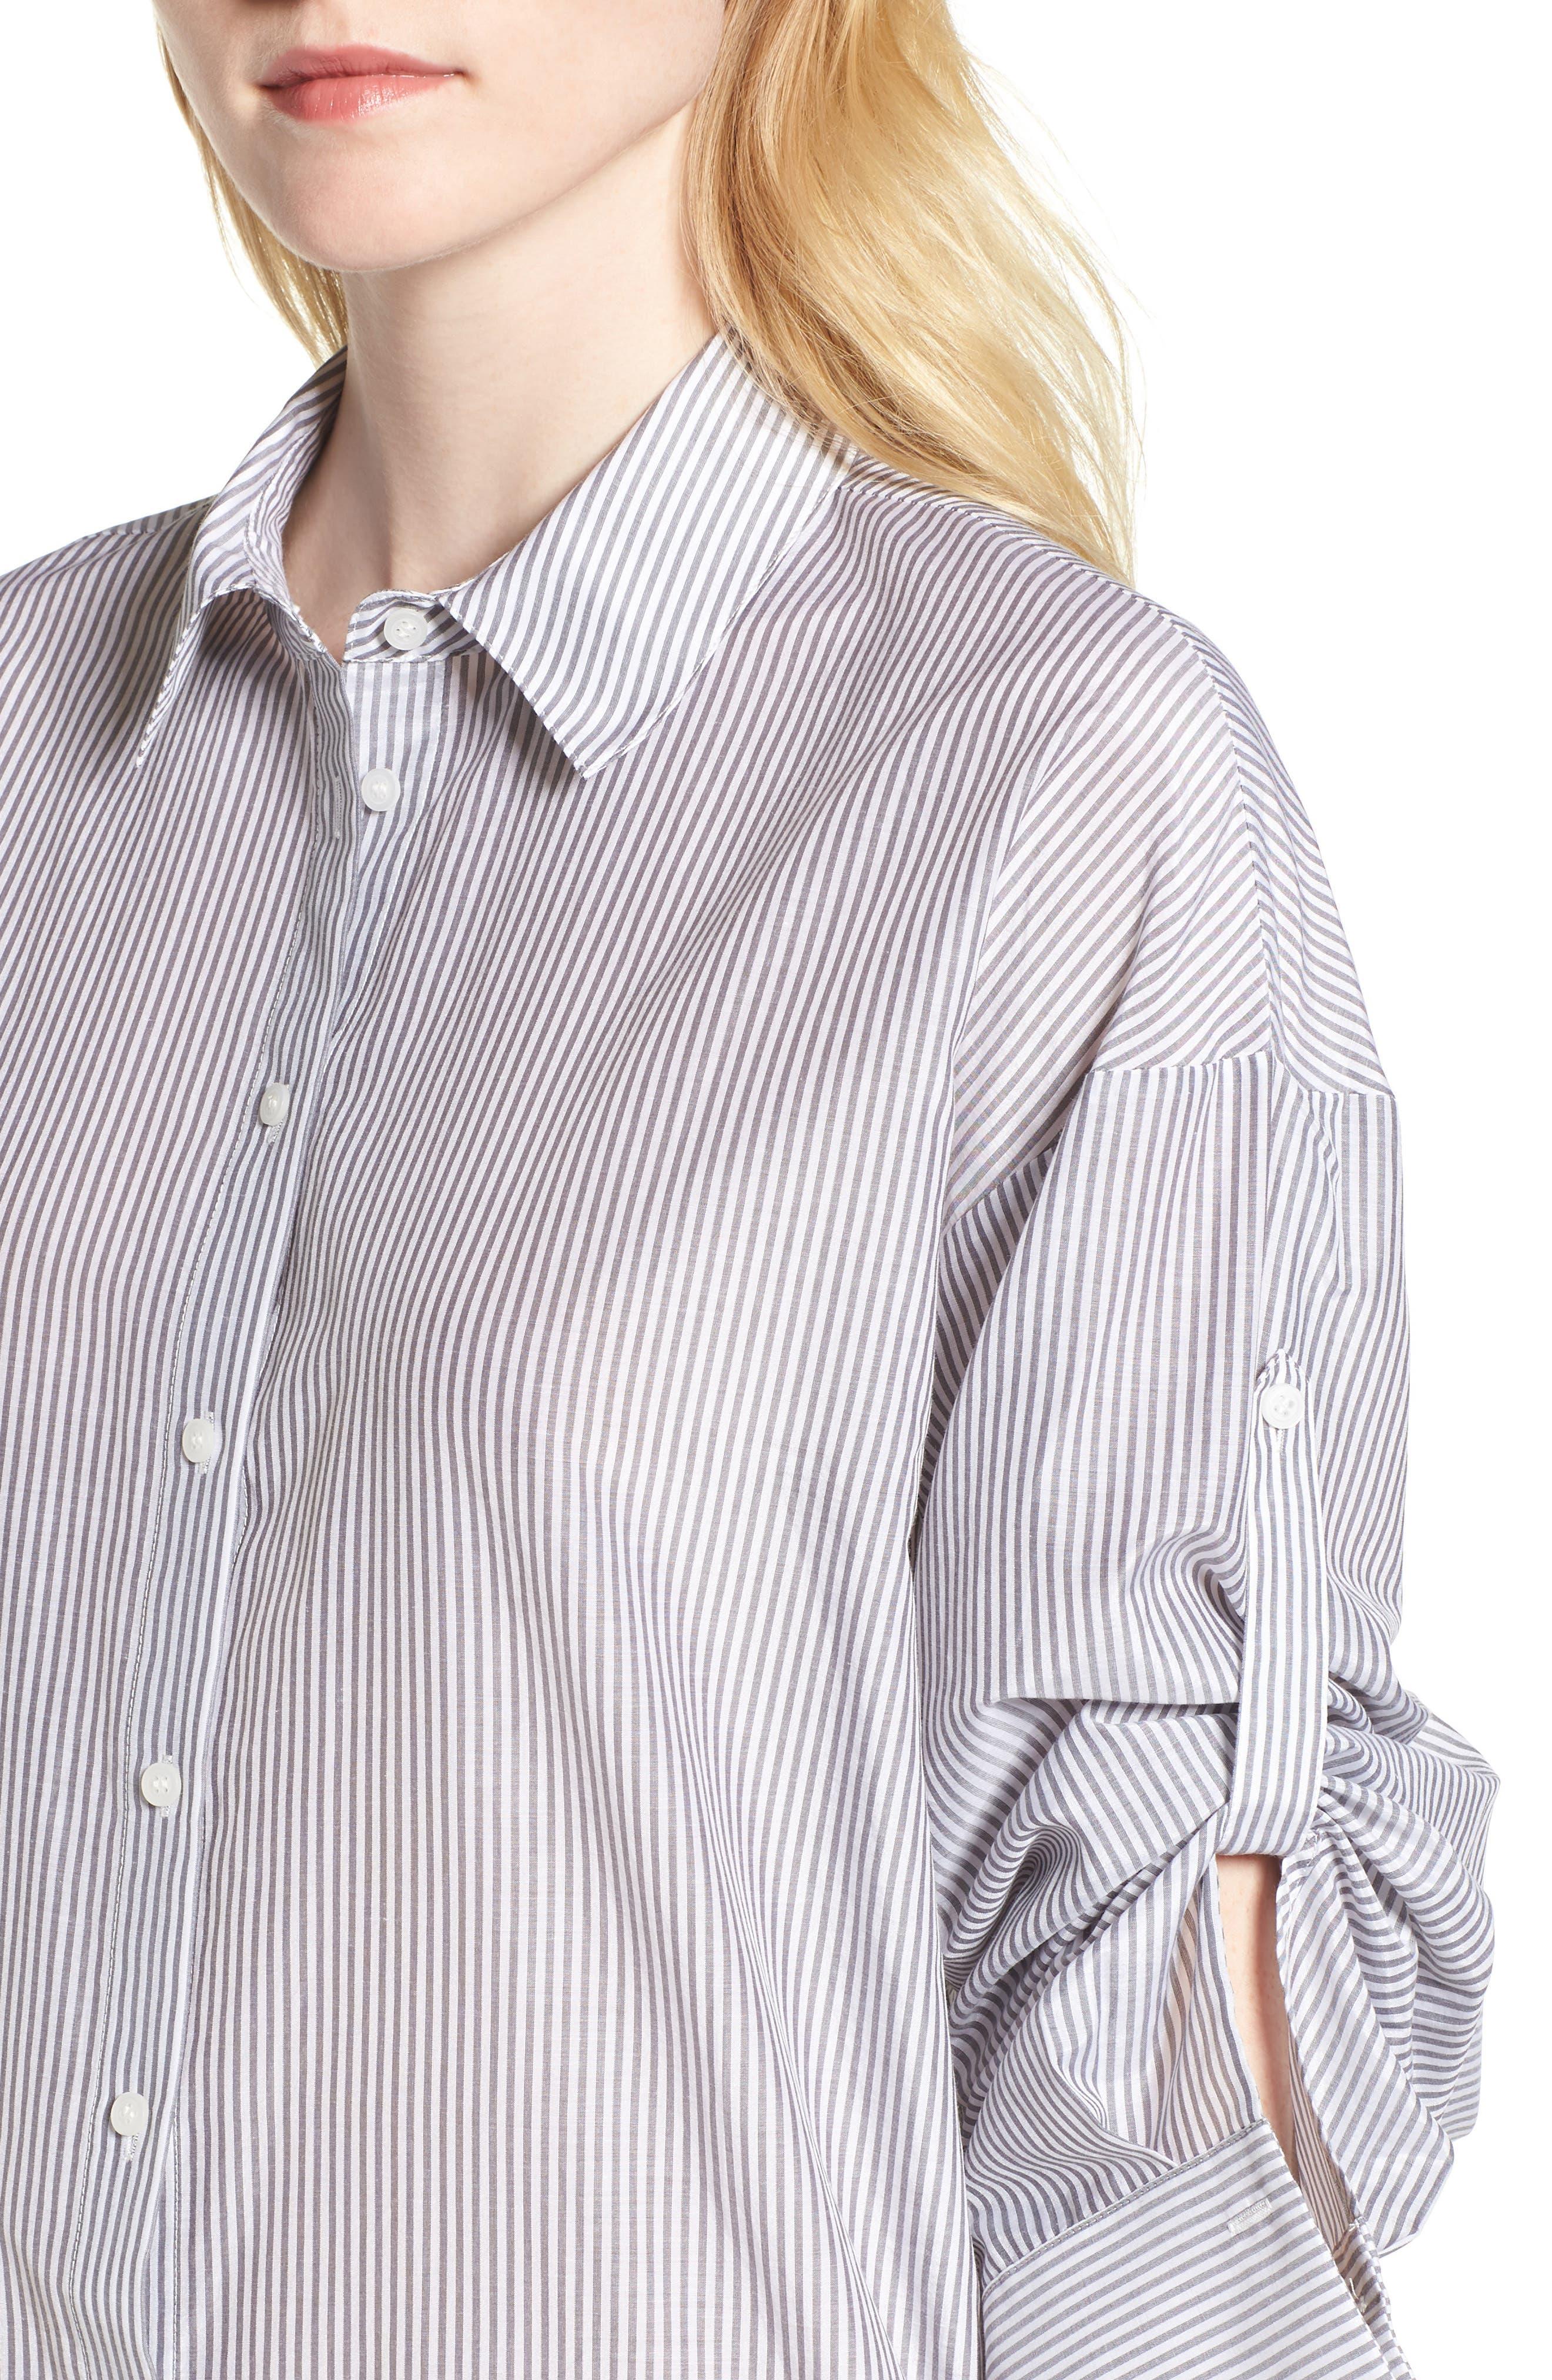 Stripe Cotton & Silk Shirtdress,                             Alternate thumbnail 4, color,                             White- Grey Even Stripe